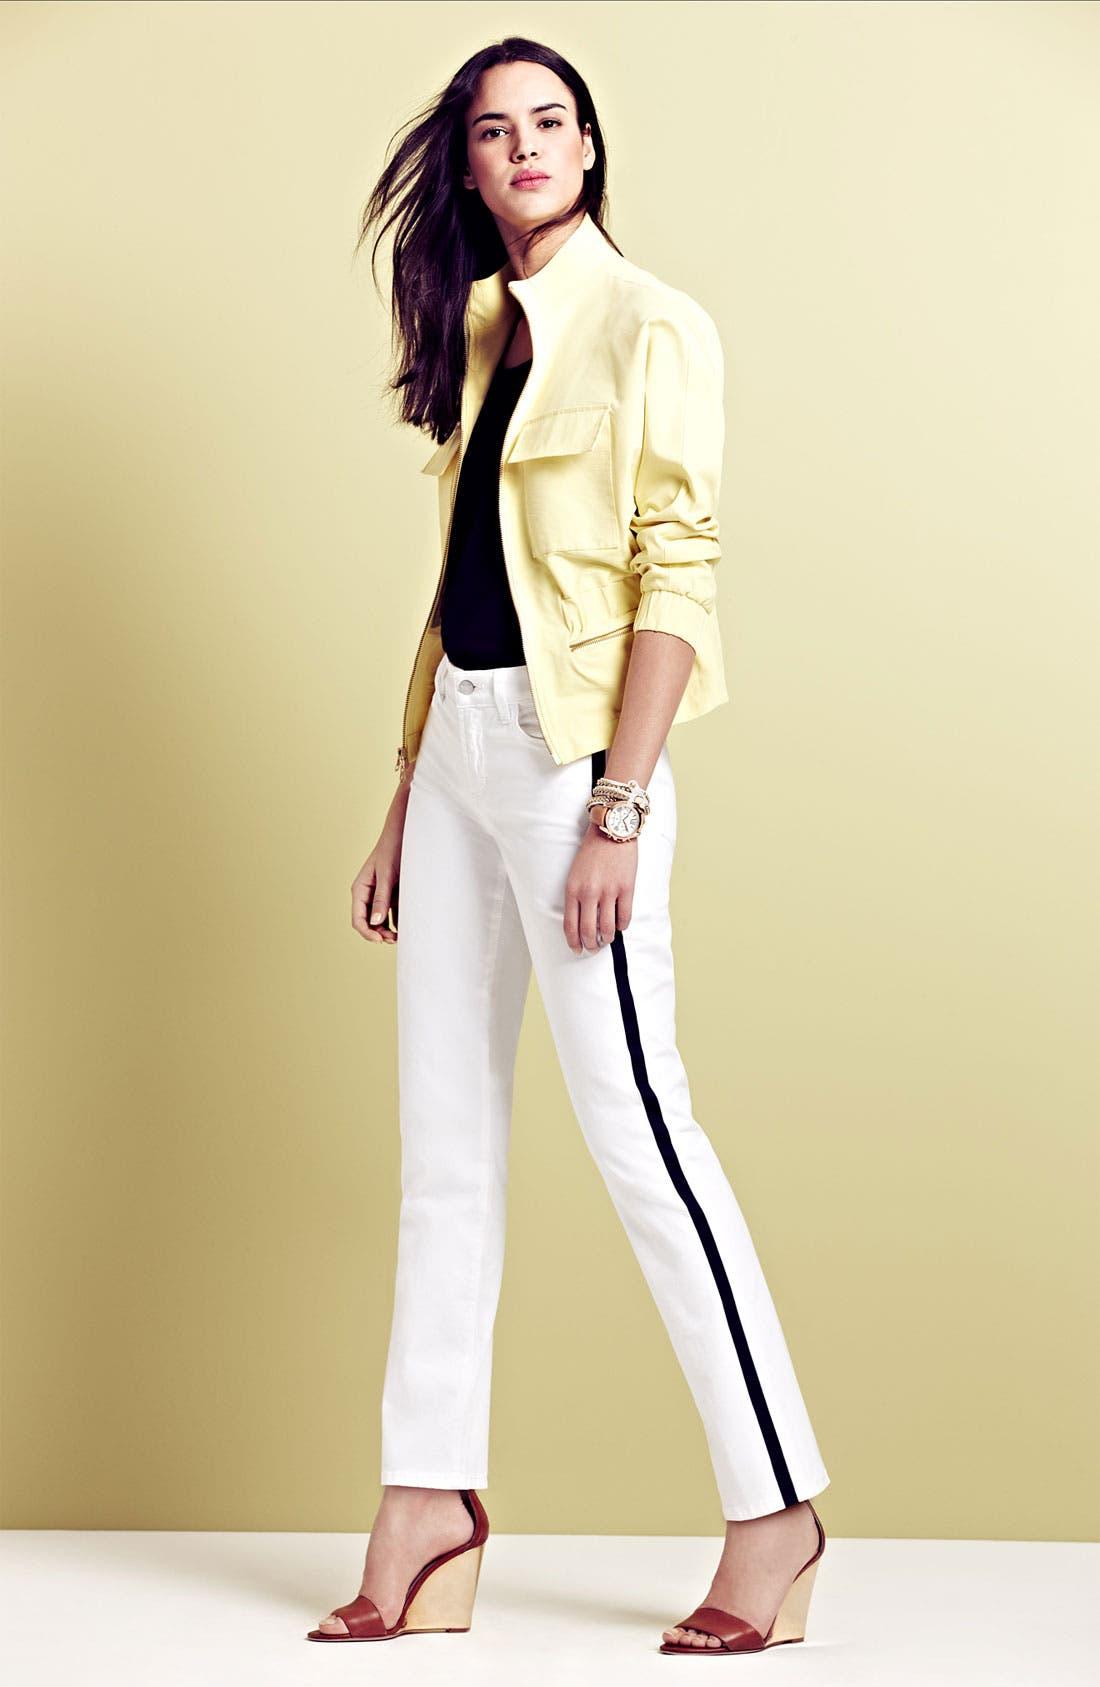 Alternate Image 1 Selected - NYDJ 'Sheri' Tuxedo Jeans & Top, Isaac Mizrahi New York Anorak